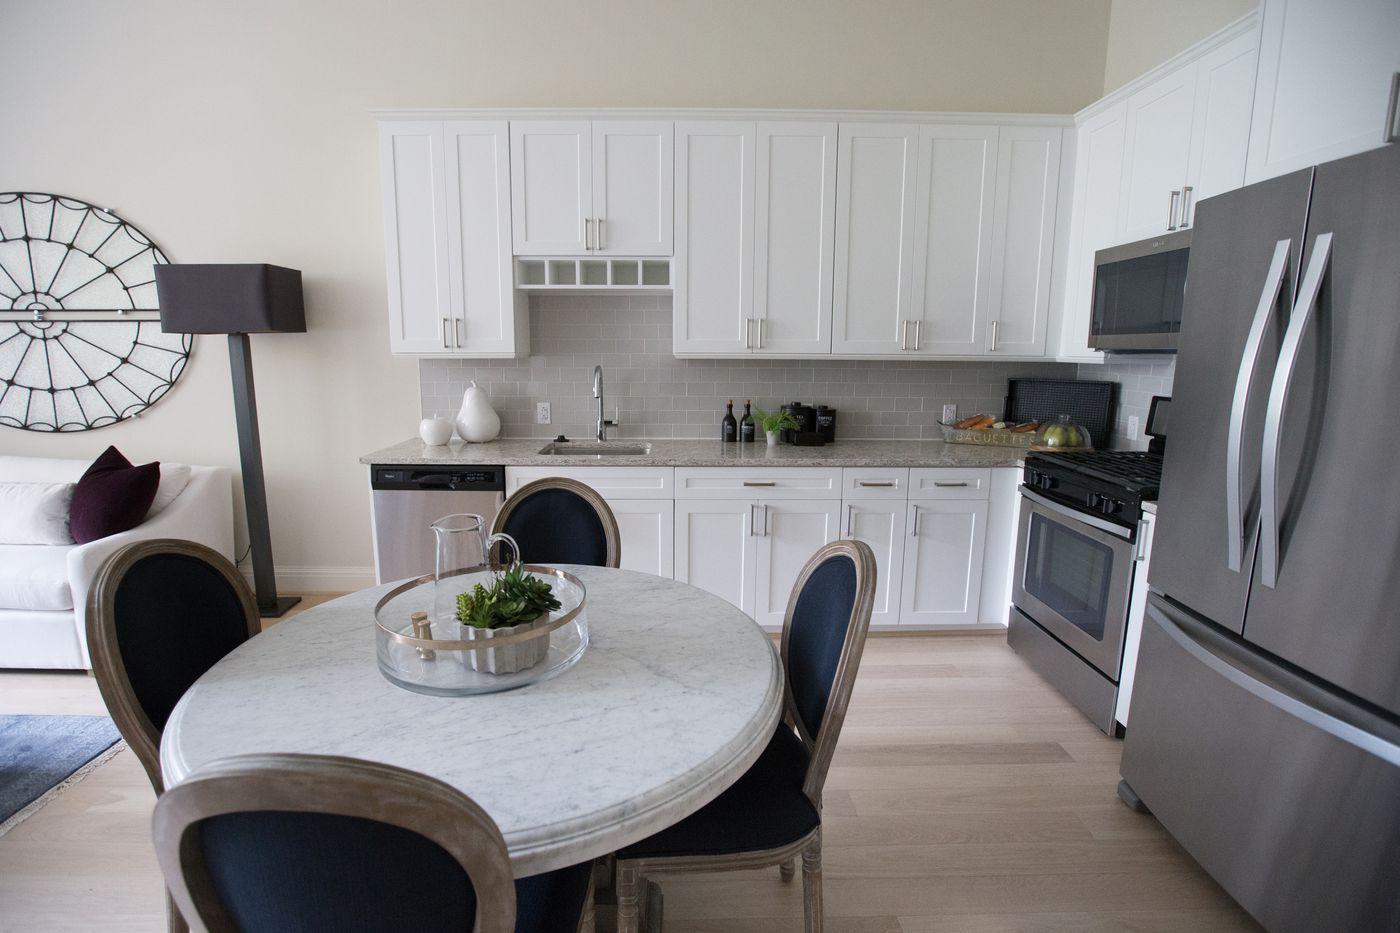 For rent in philadelphia for 9 300 a 3 bedroom penthouse - Philadelphia 1 bedroom apartments for rent ...